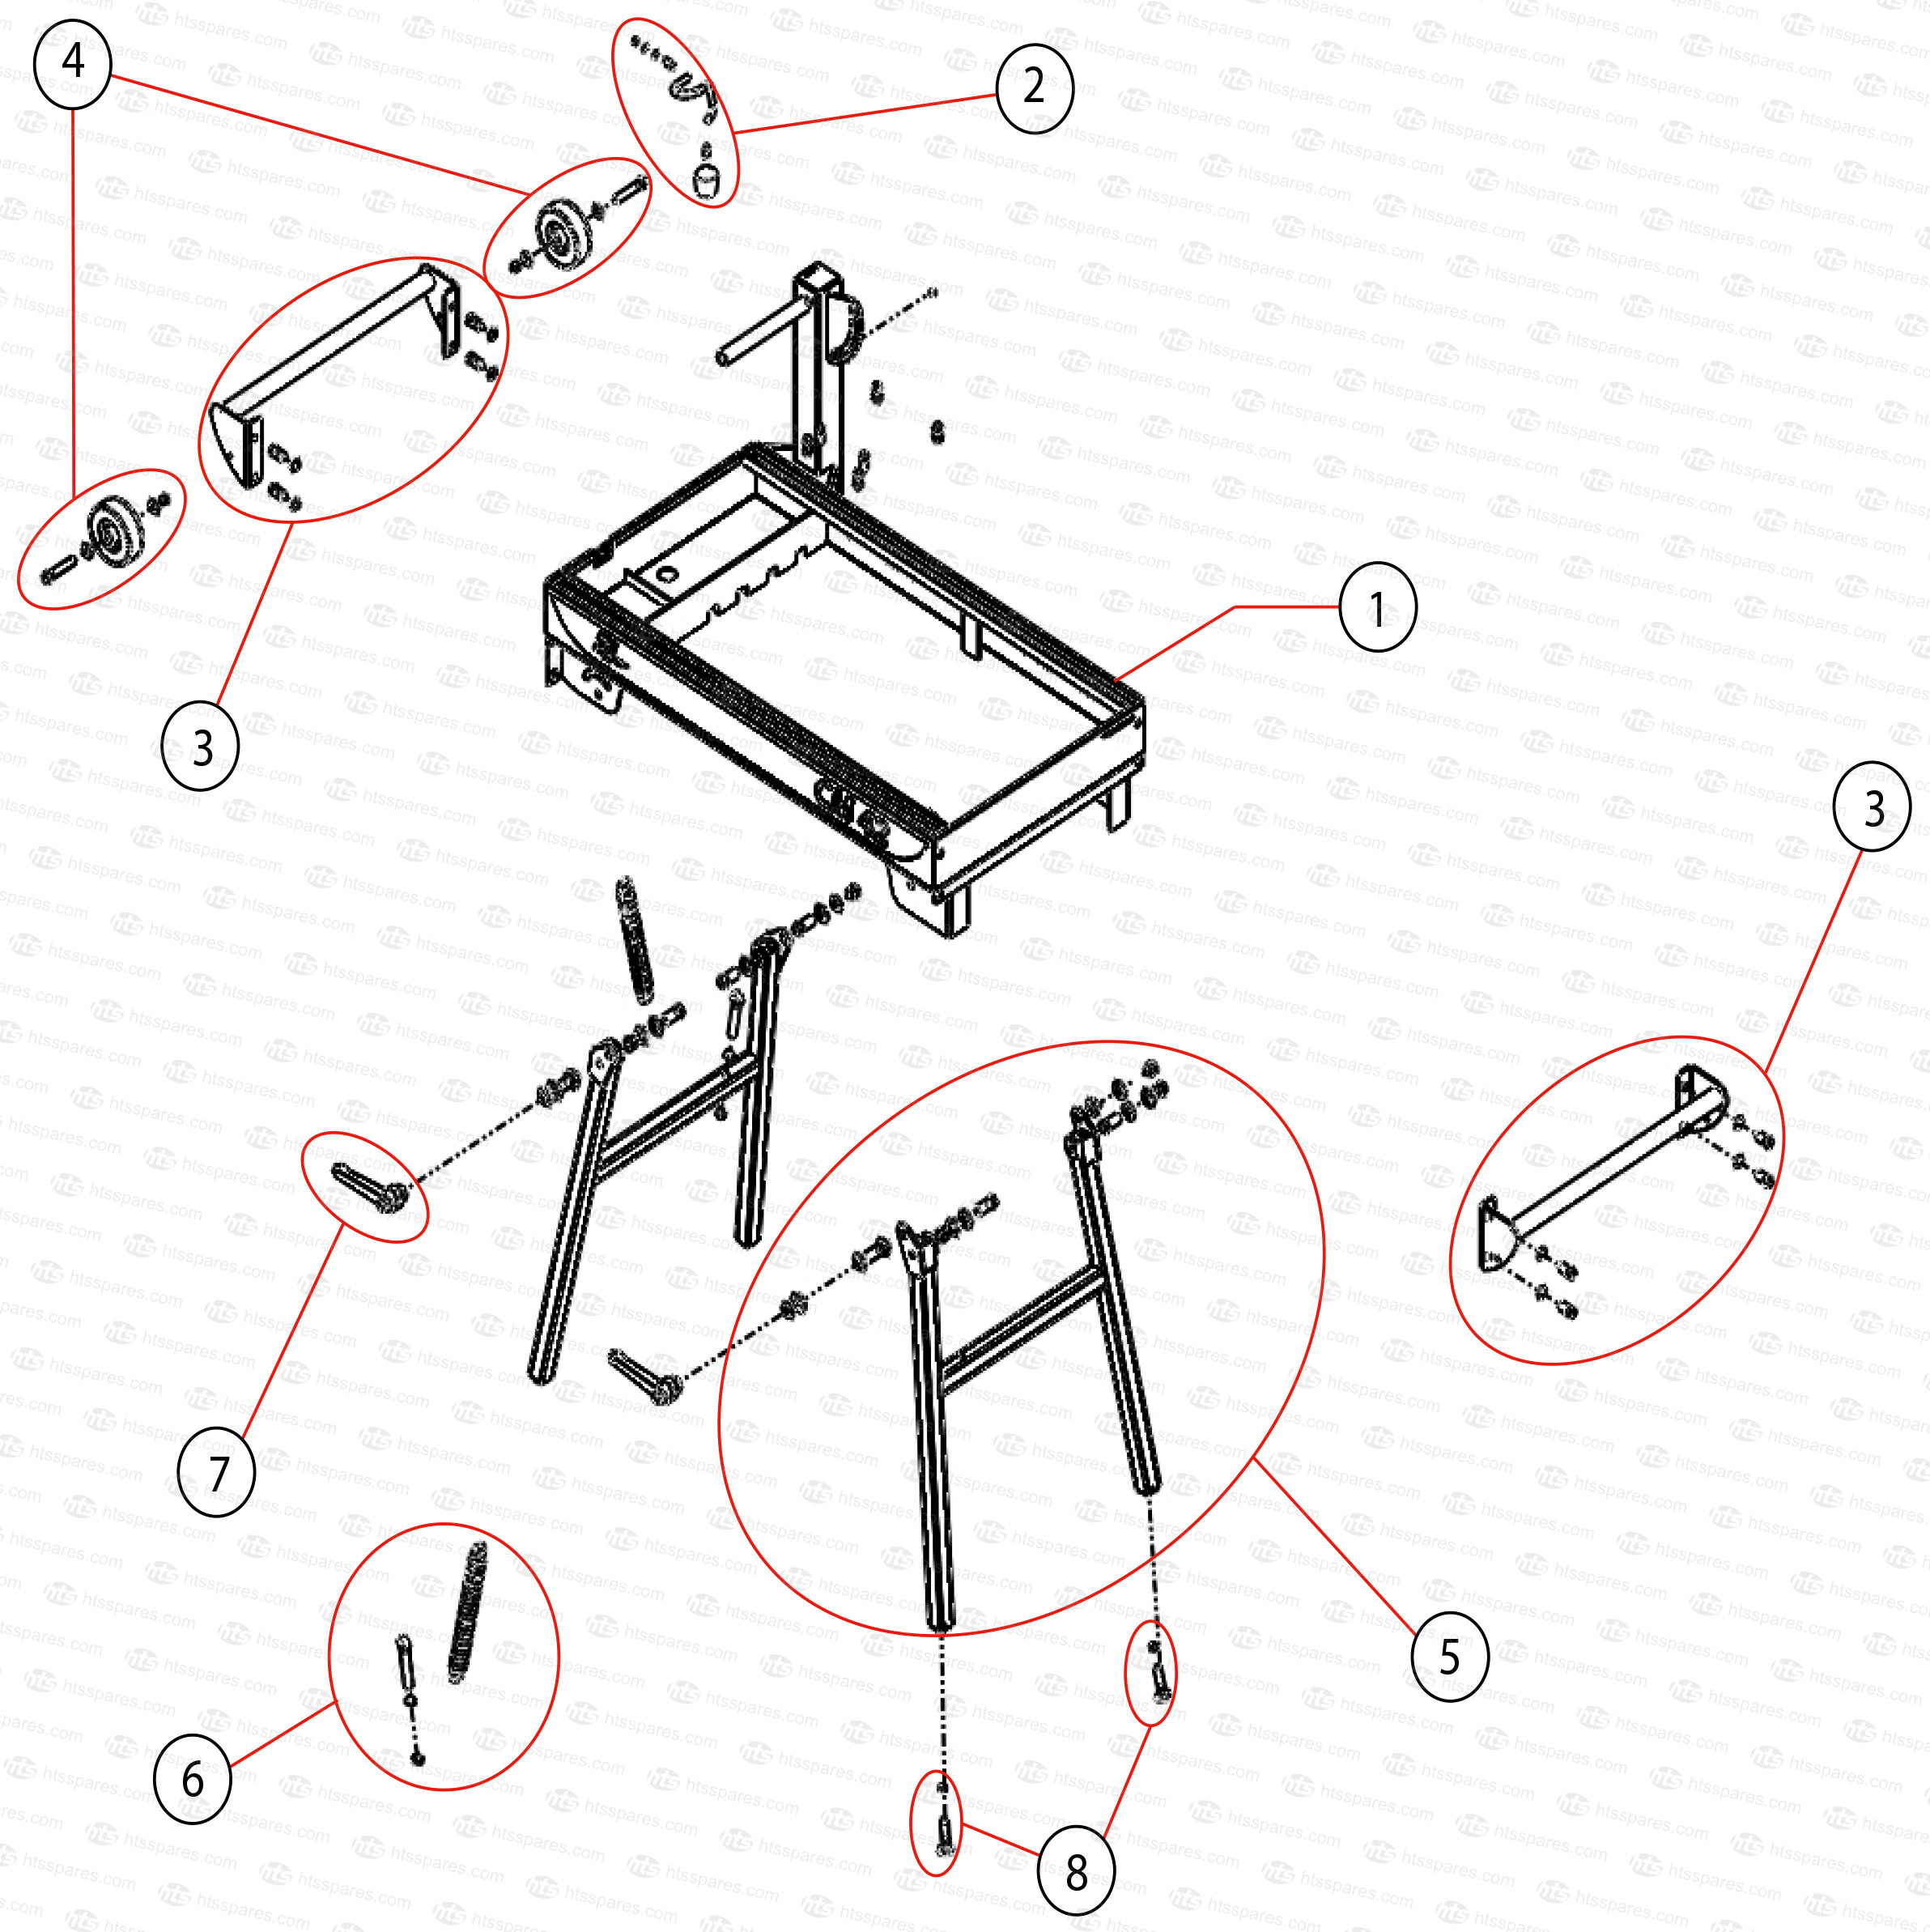 clipper cm42 main frame parts norton clipper cm42 tablesaw parts rh htsspares com